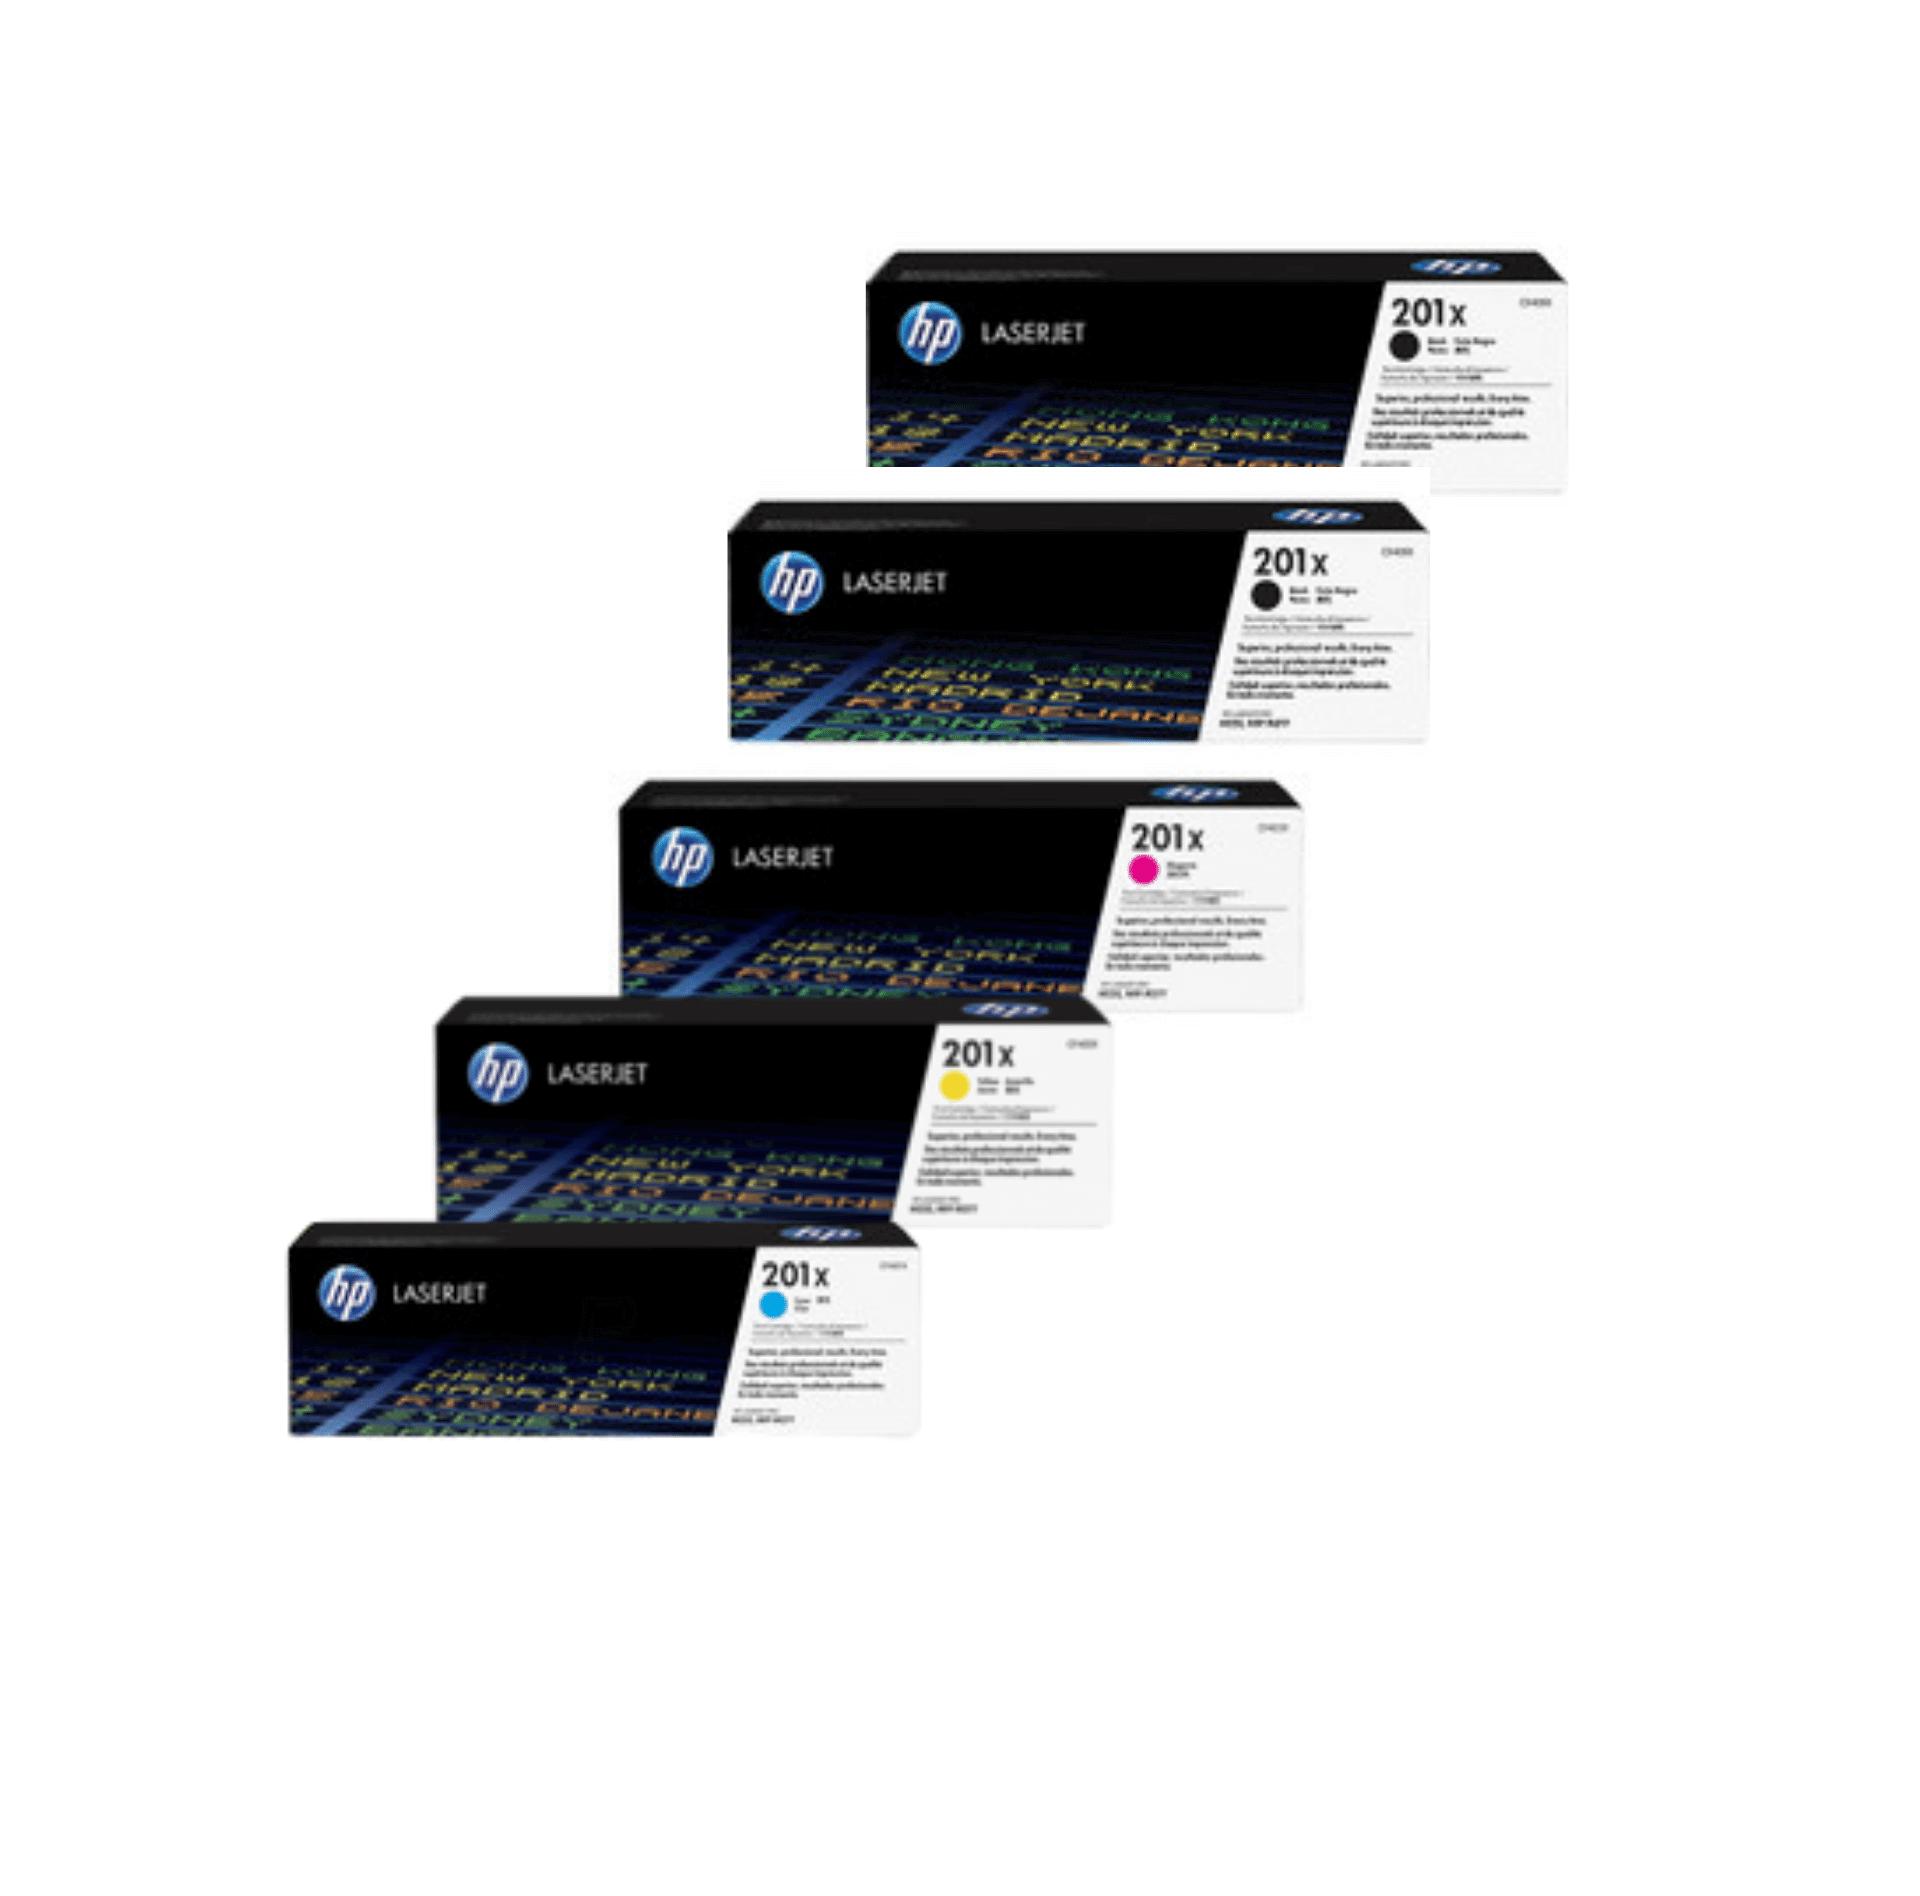 HP 201X Toner Cartridges Value Pack - Includes: [2 x Black, 1 x Cyan, Magenta, Yellow]